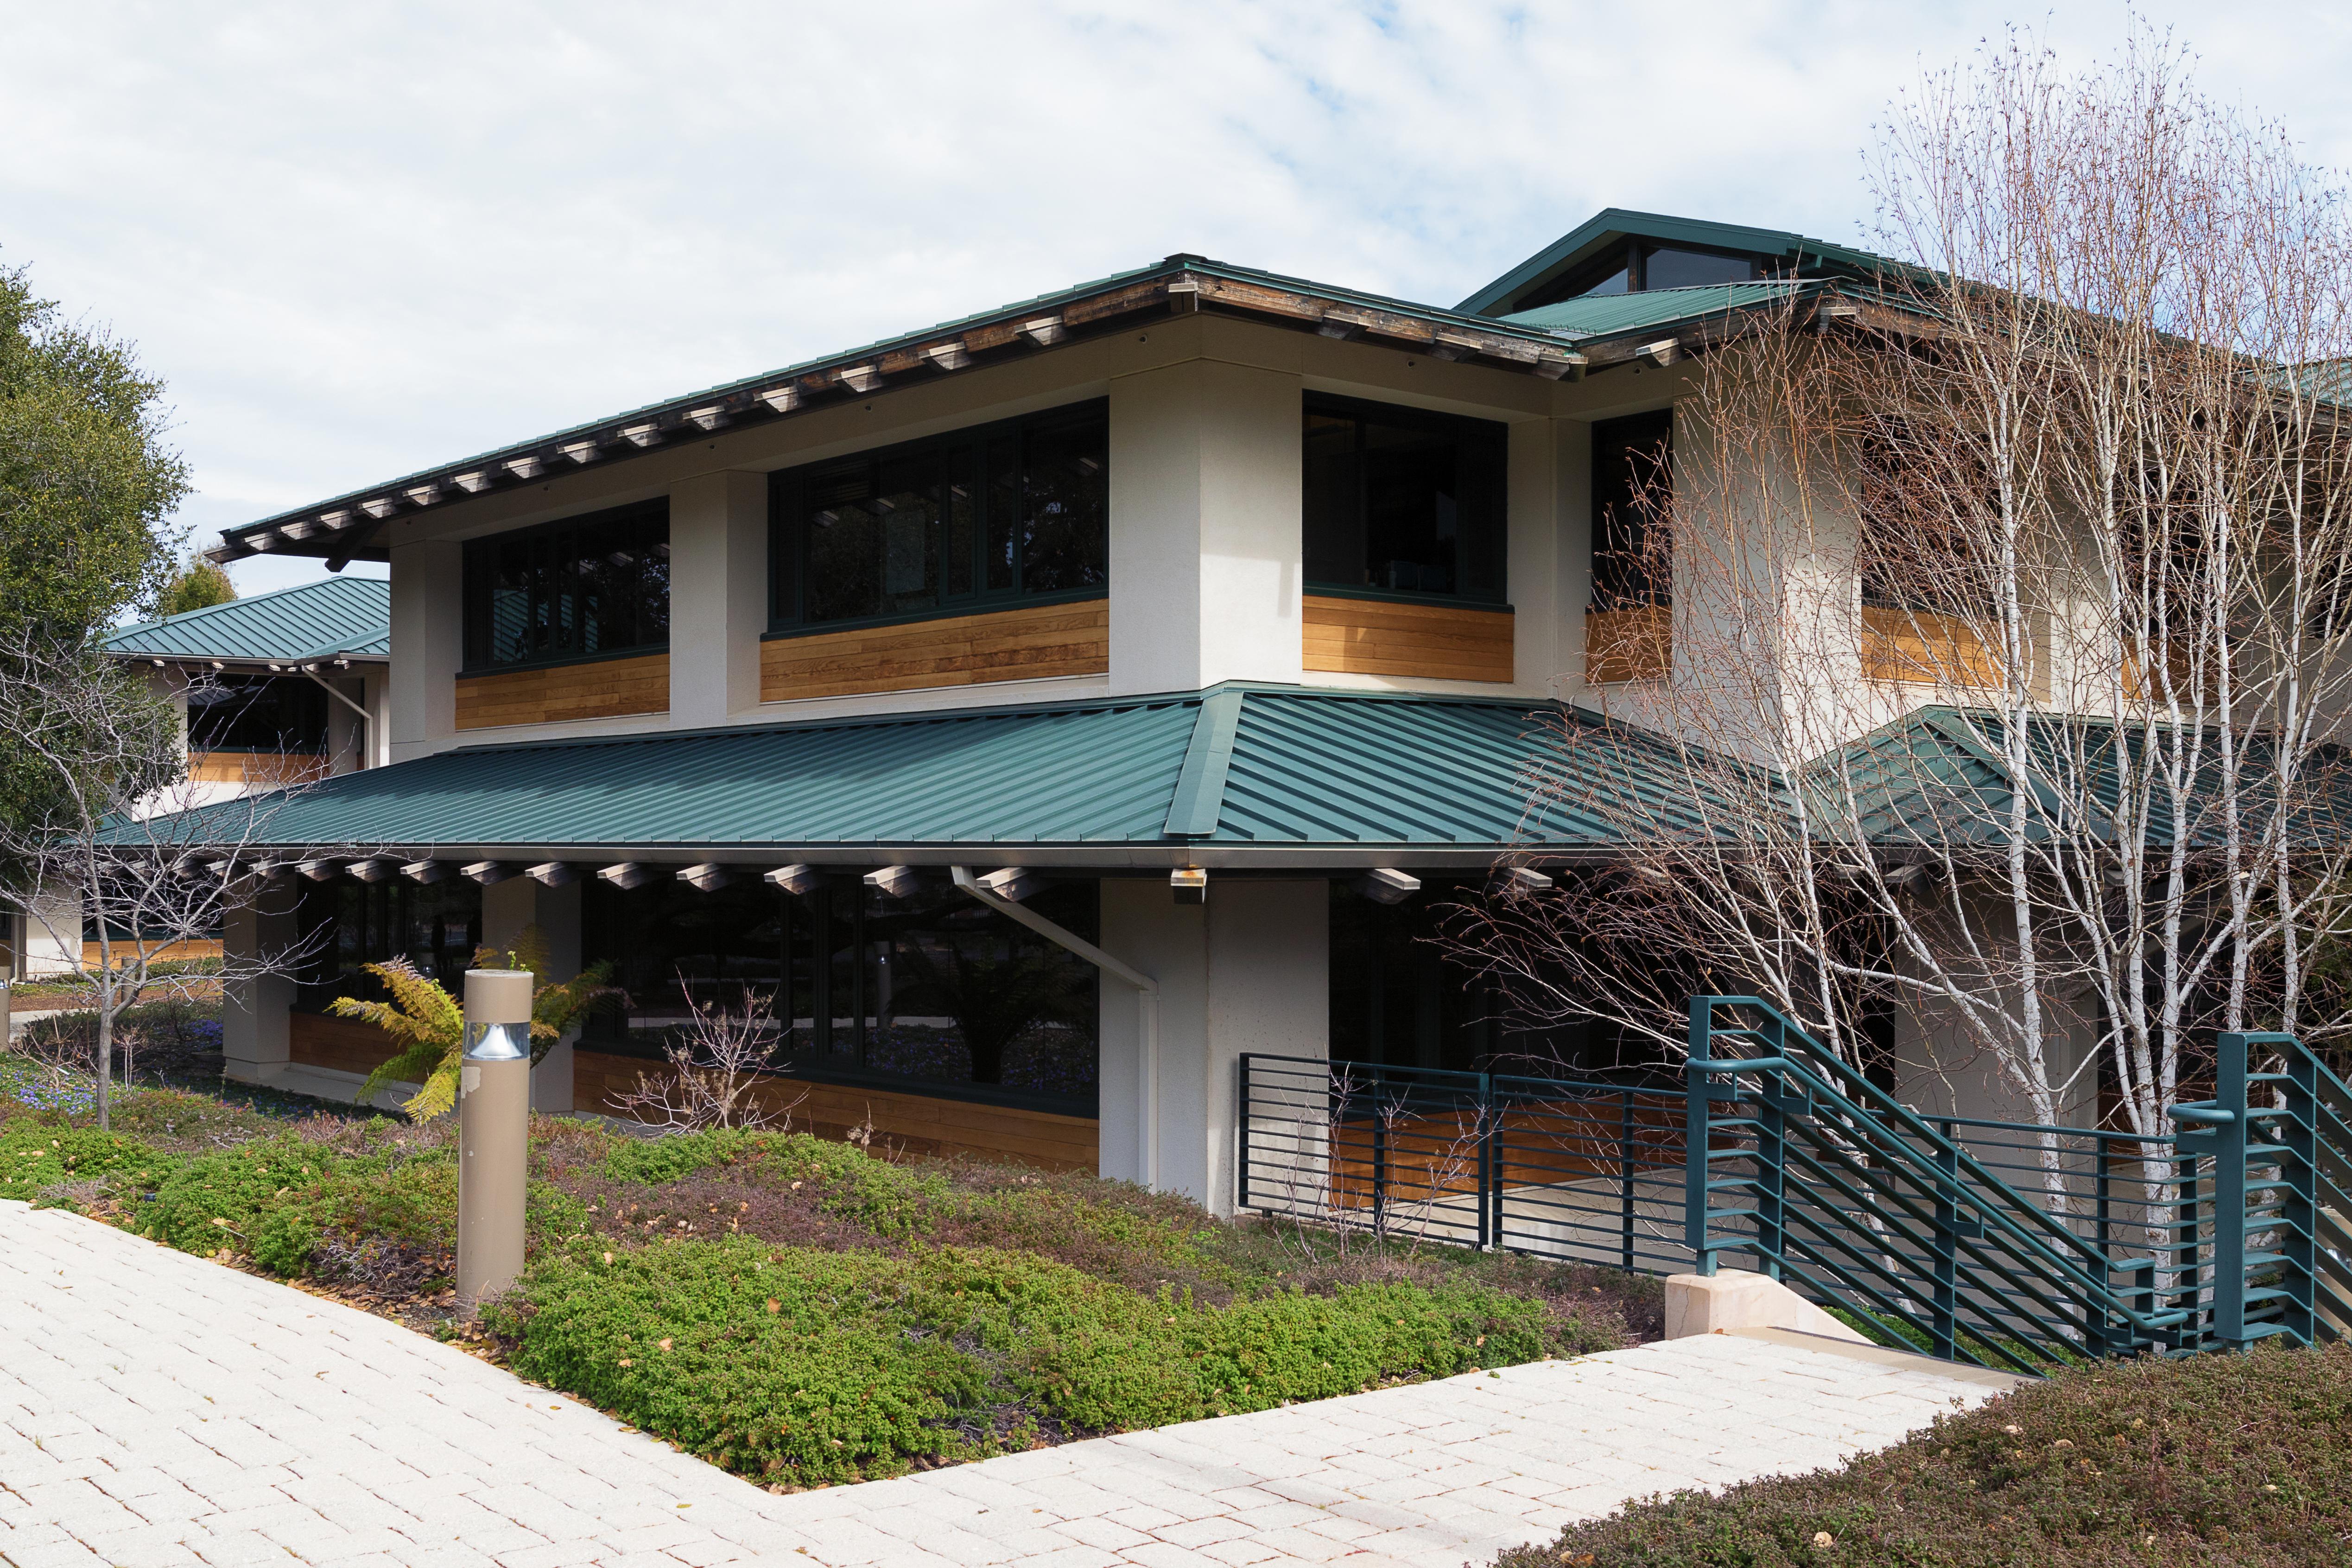 exterior office. Datei:Hewlett Foundation Office Building, Exterior.jpg Exterior C